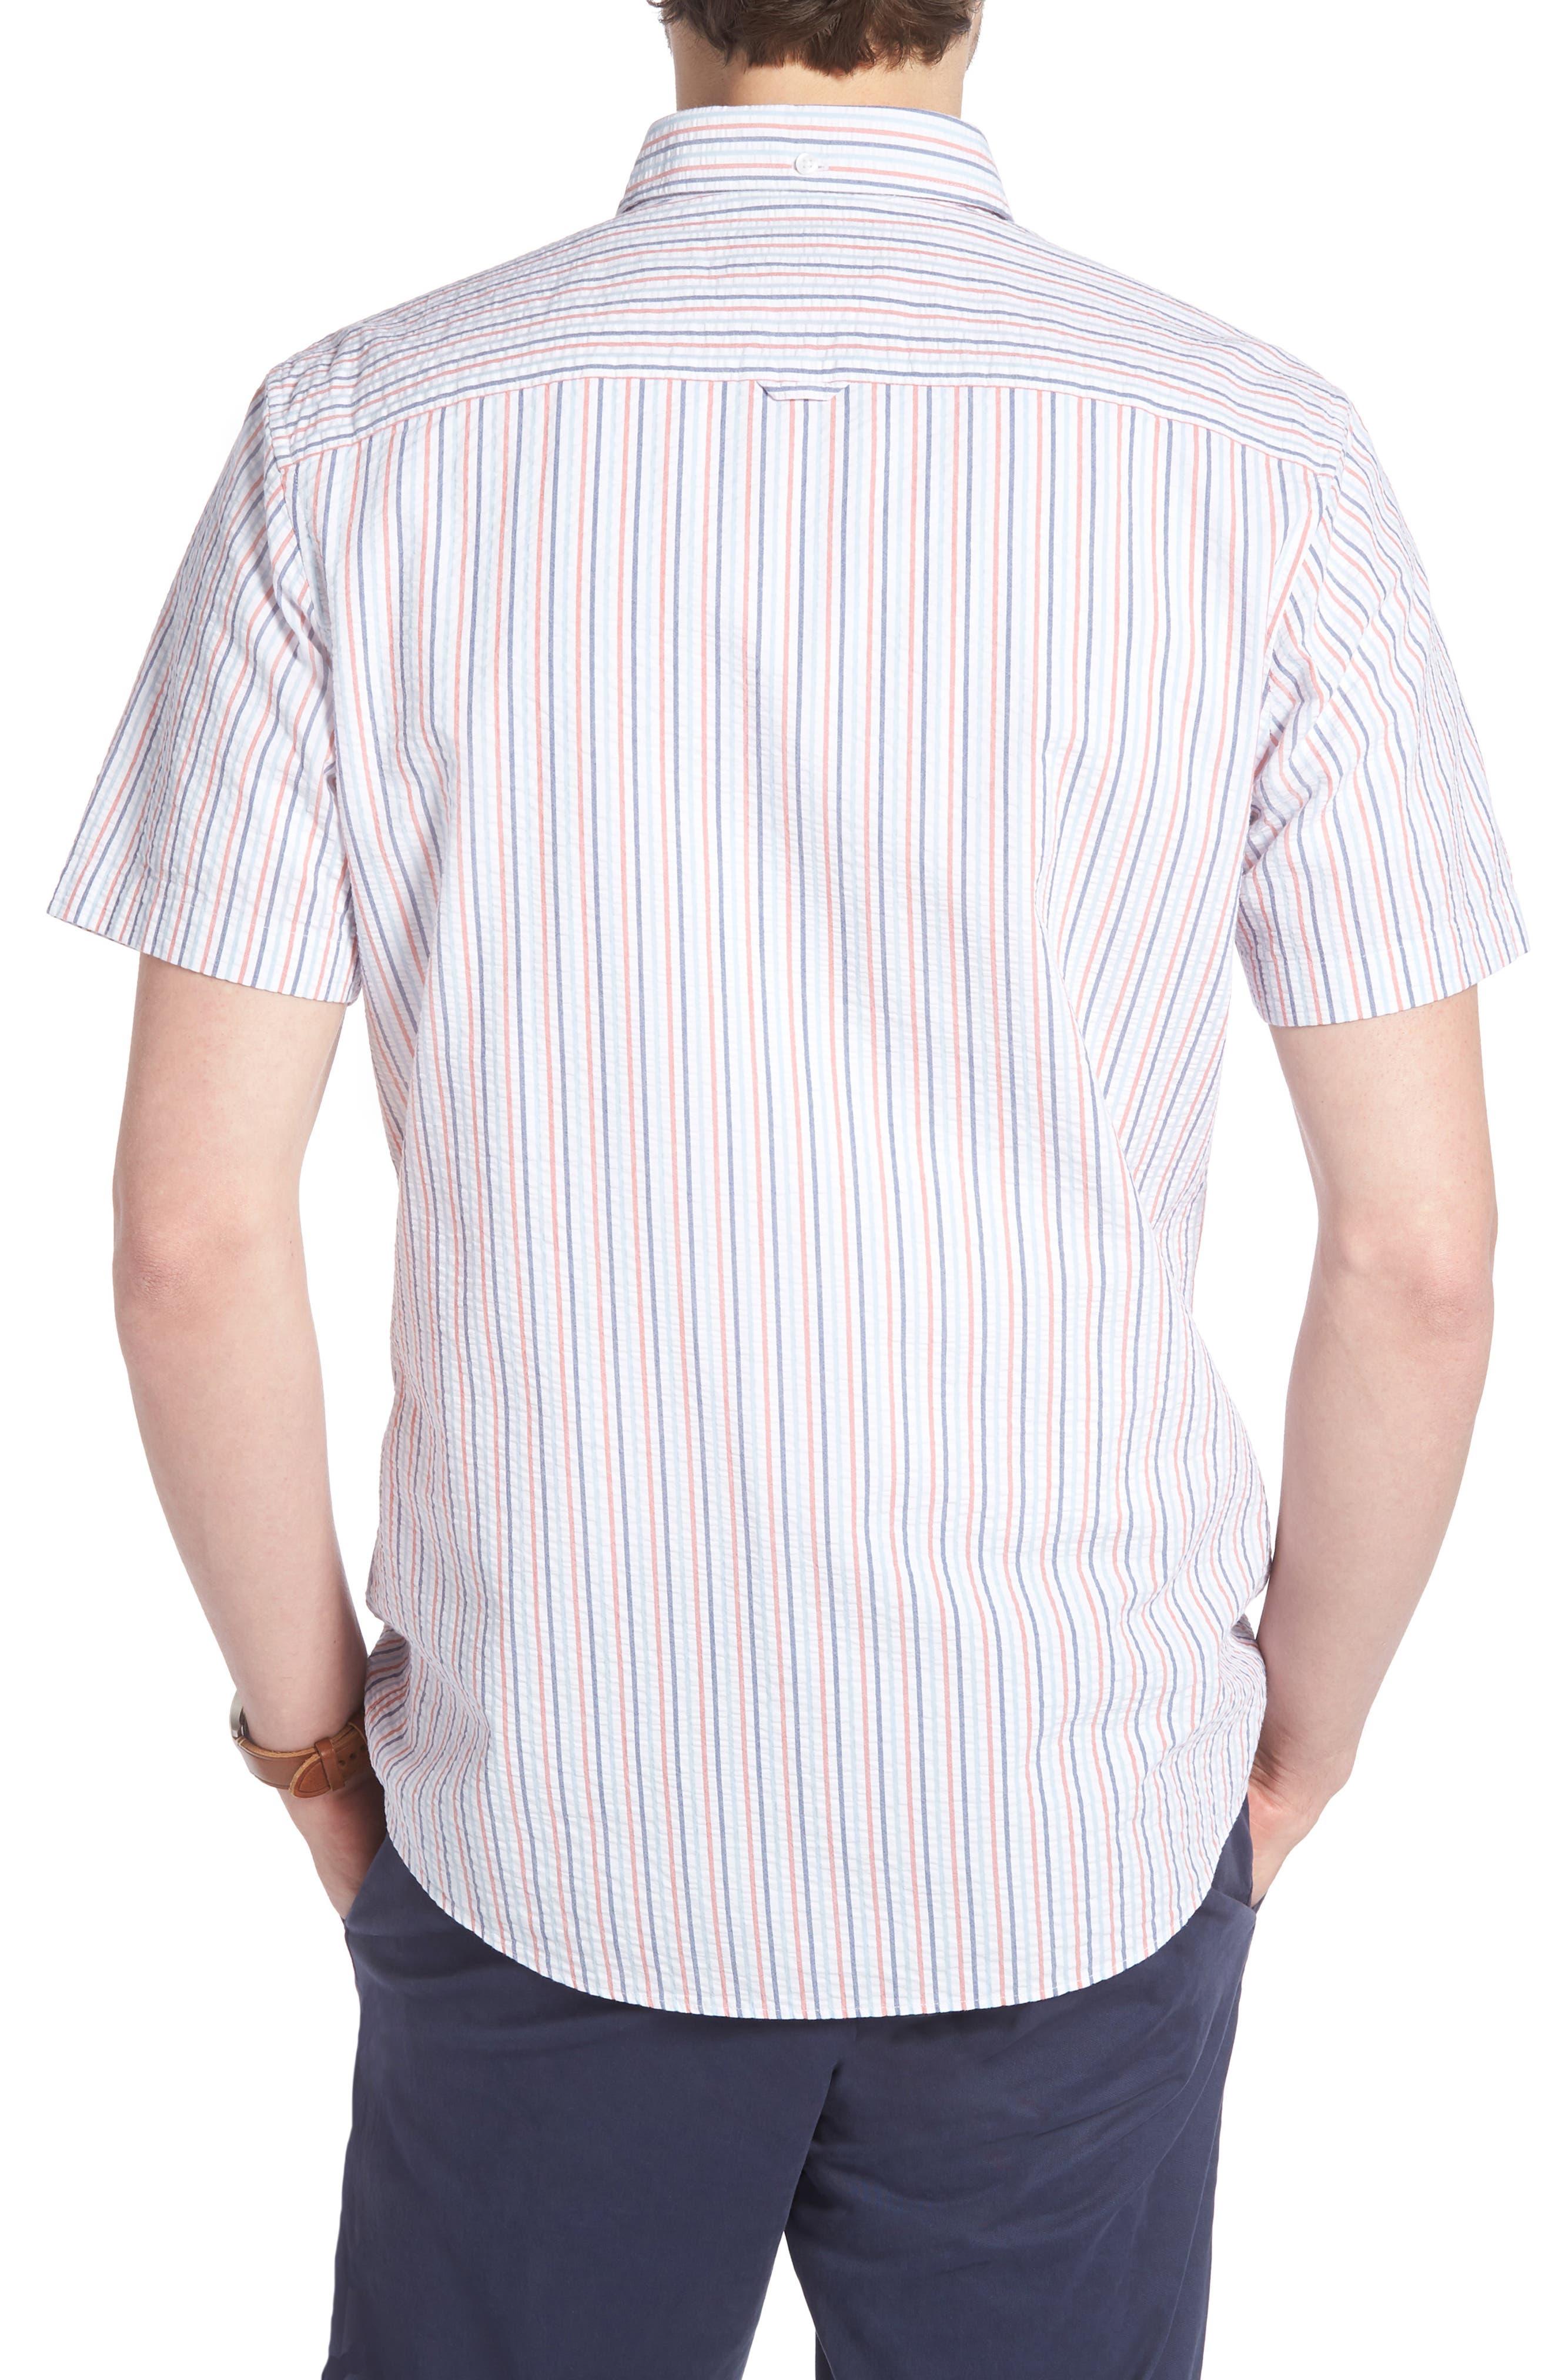 Trim Fit Seersucker Short Sleeve Sport Shirt,                             Alternate thumbnail 2, color,                             WHITE MULTI PENCIL STRIPE